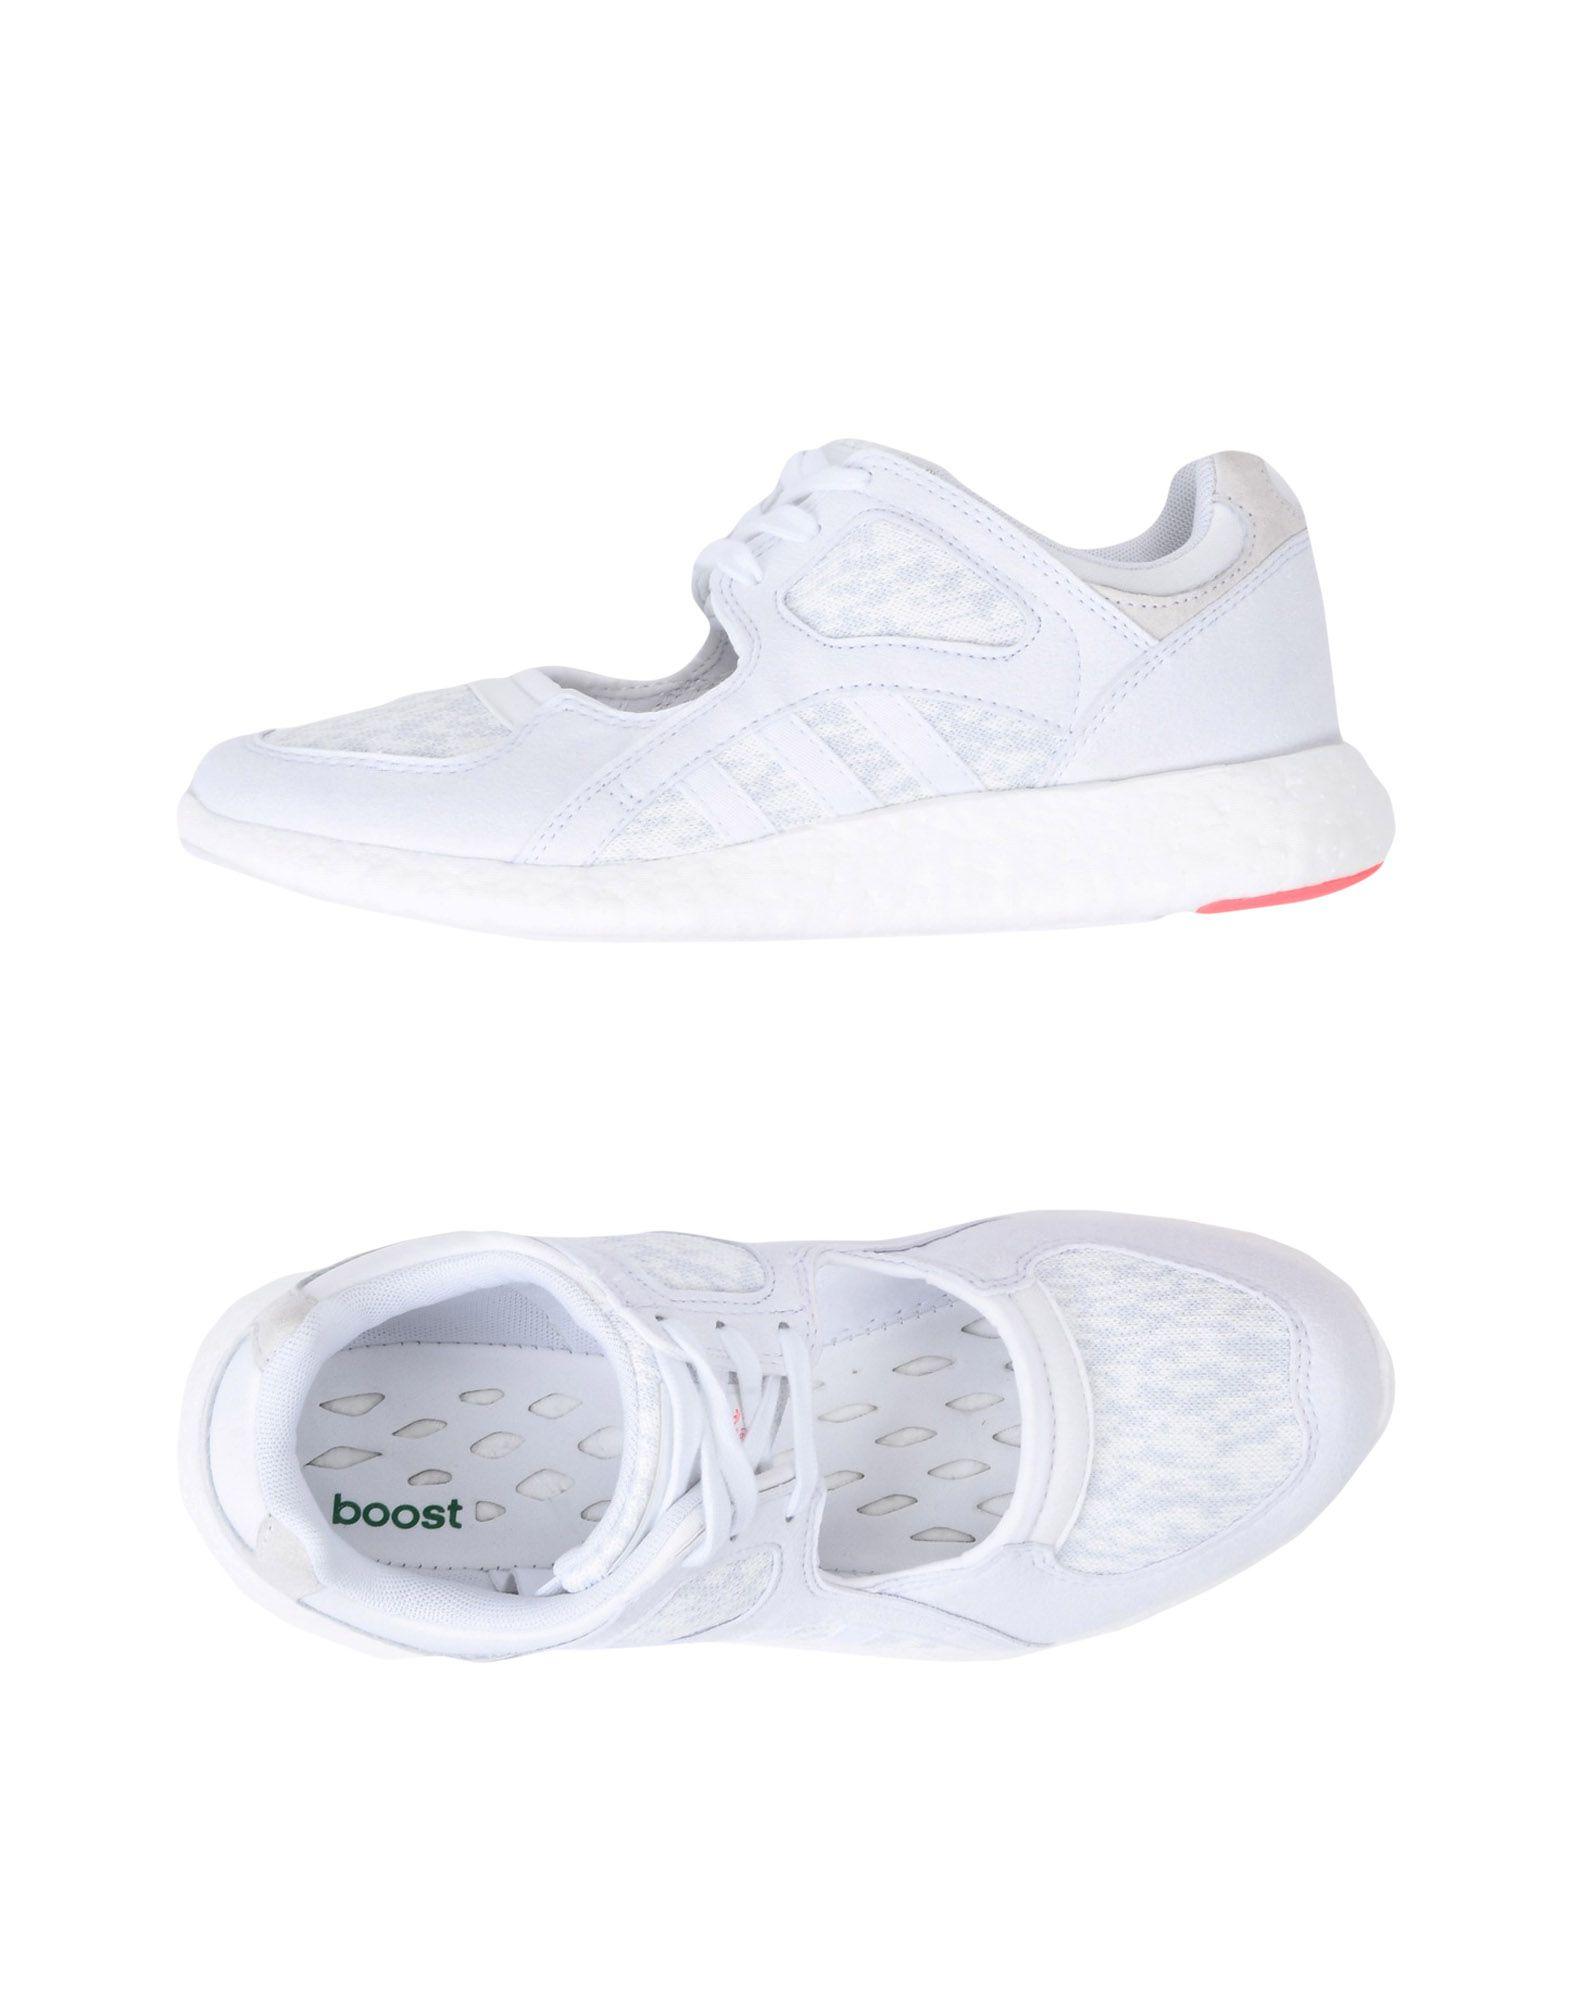 Sneakers Adidas Originals Equipment Racing 91 - Donna - 11238086OV